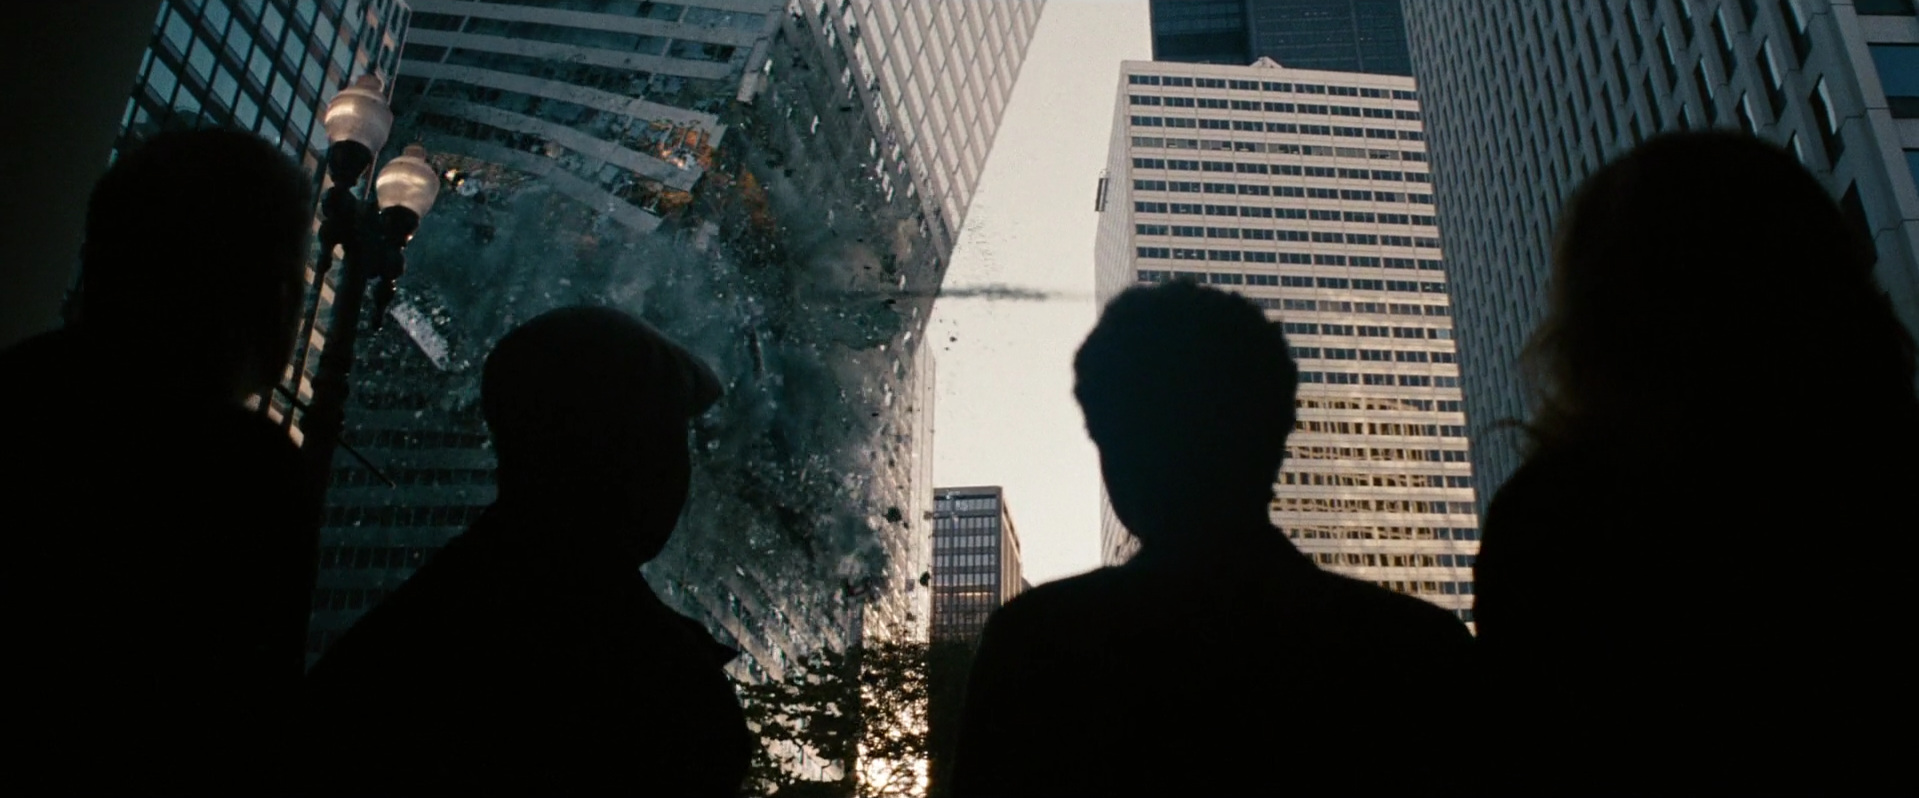 Man of Steel  (dir. Zack Snyder, 2013)